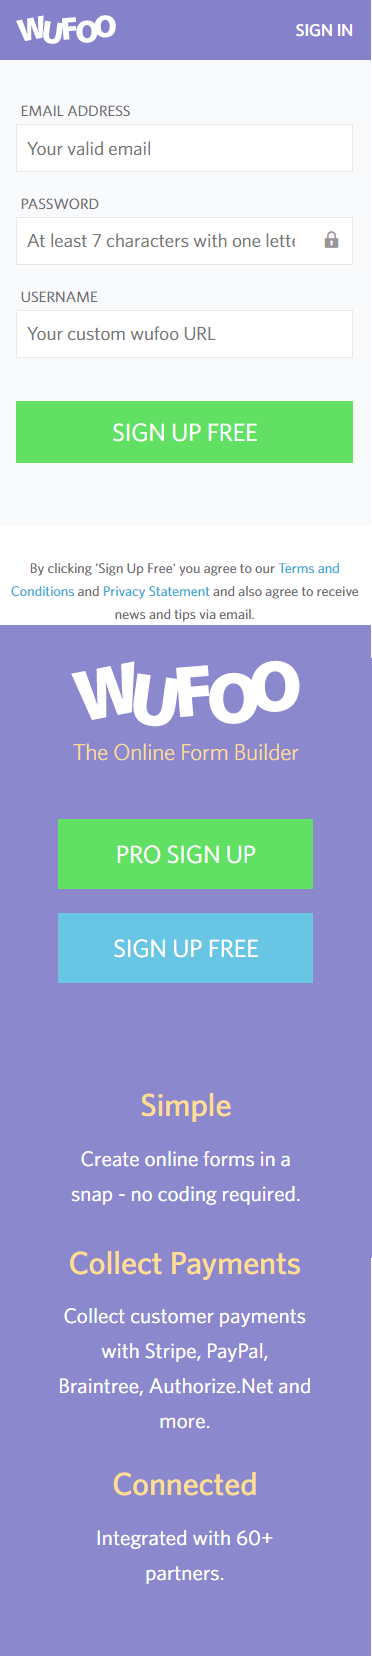 Split Test - Wufoo - Variation #1 Form